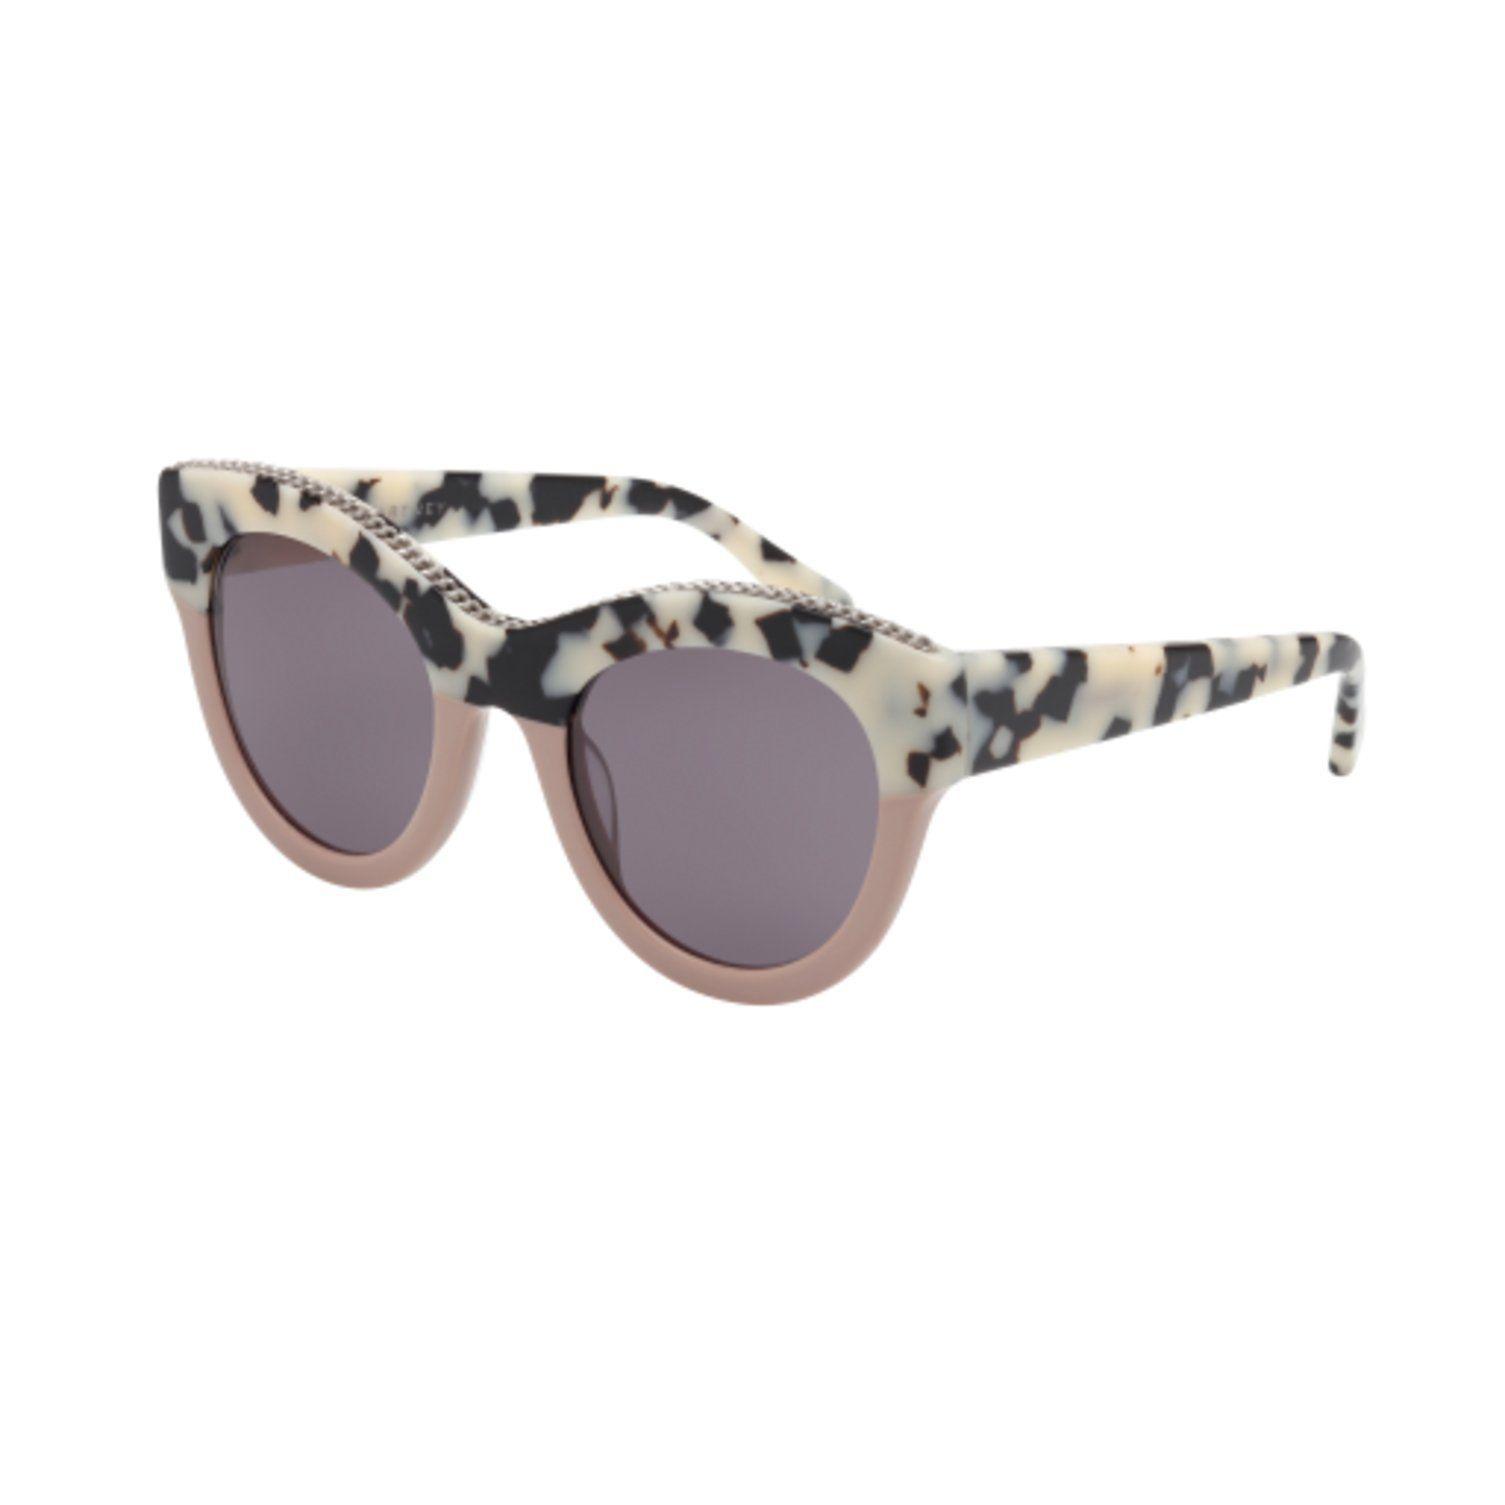 Sunglasses On Sale, Havana, 2017, one size Stella McCartney